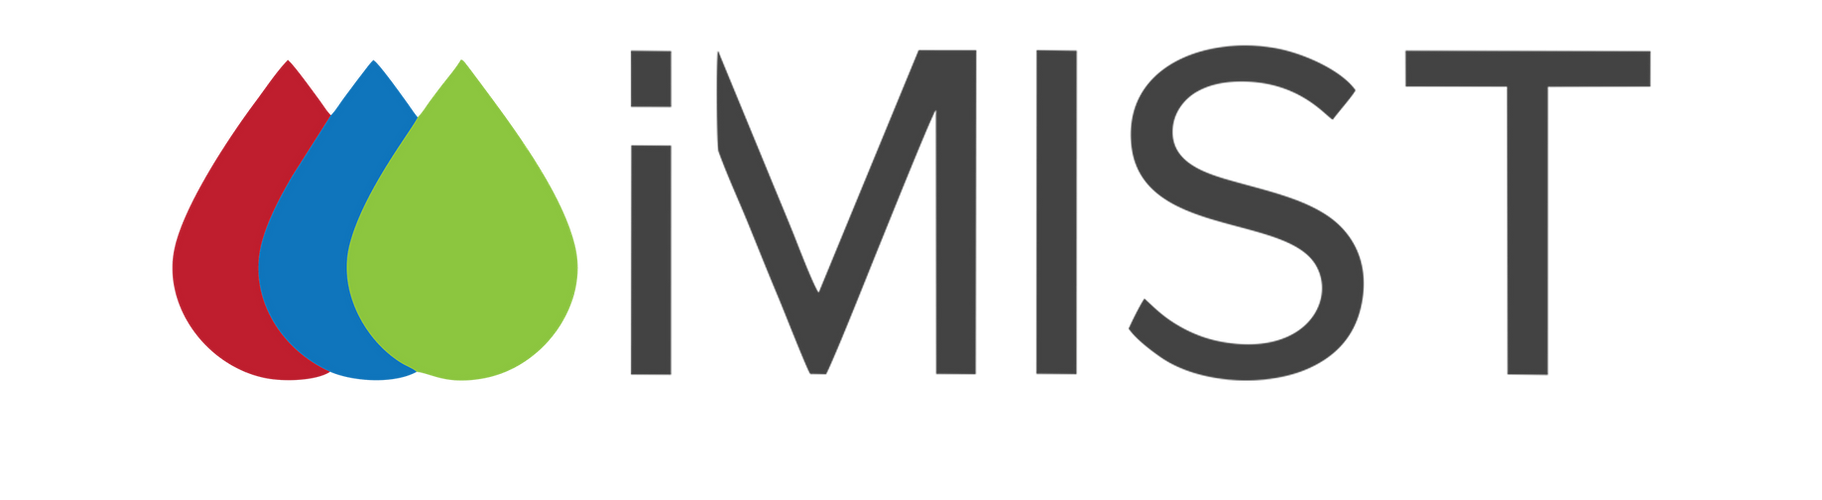 cropped-iMist-Logo-grey-no-crop-1-2.png